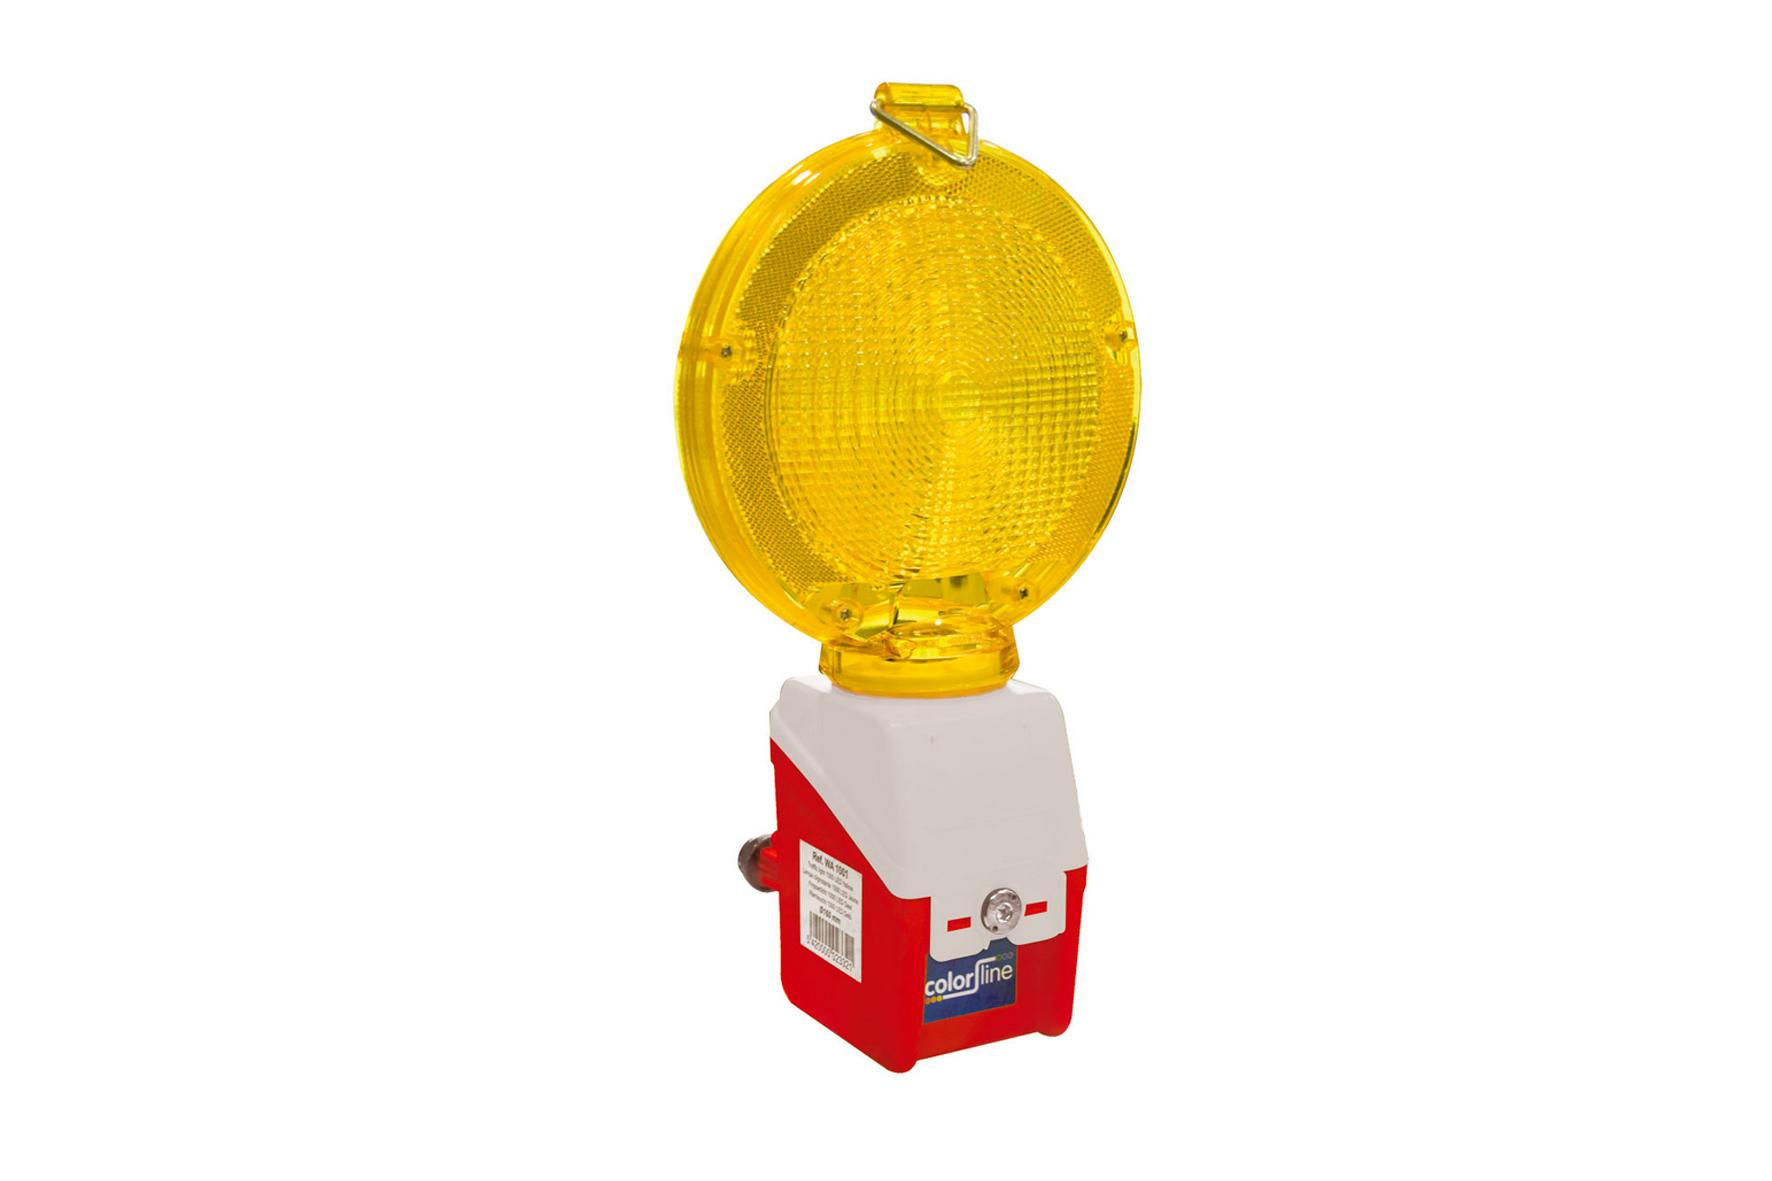 Ligne Du Lampe Outillage En Rayon Achetez 1TK3uJlFc